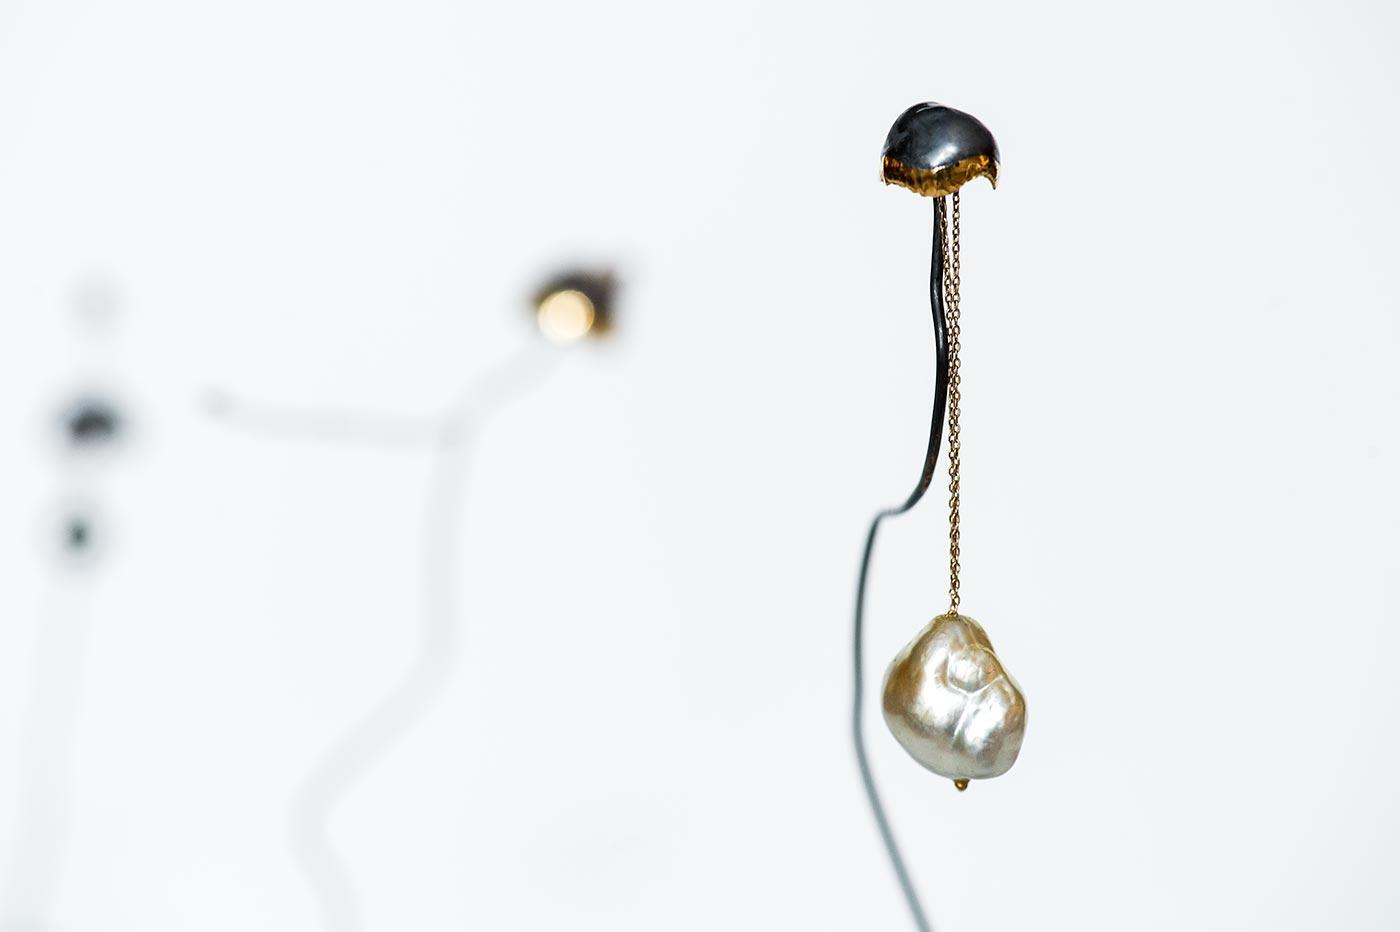 Small medusa